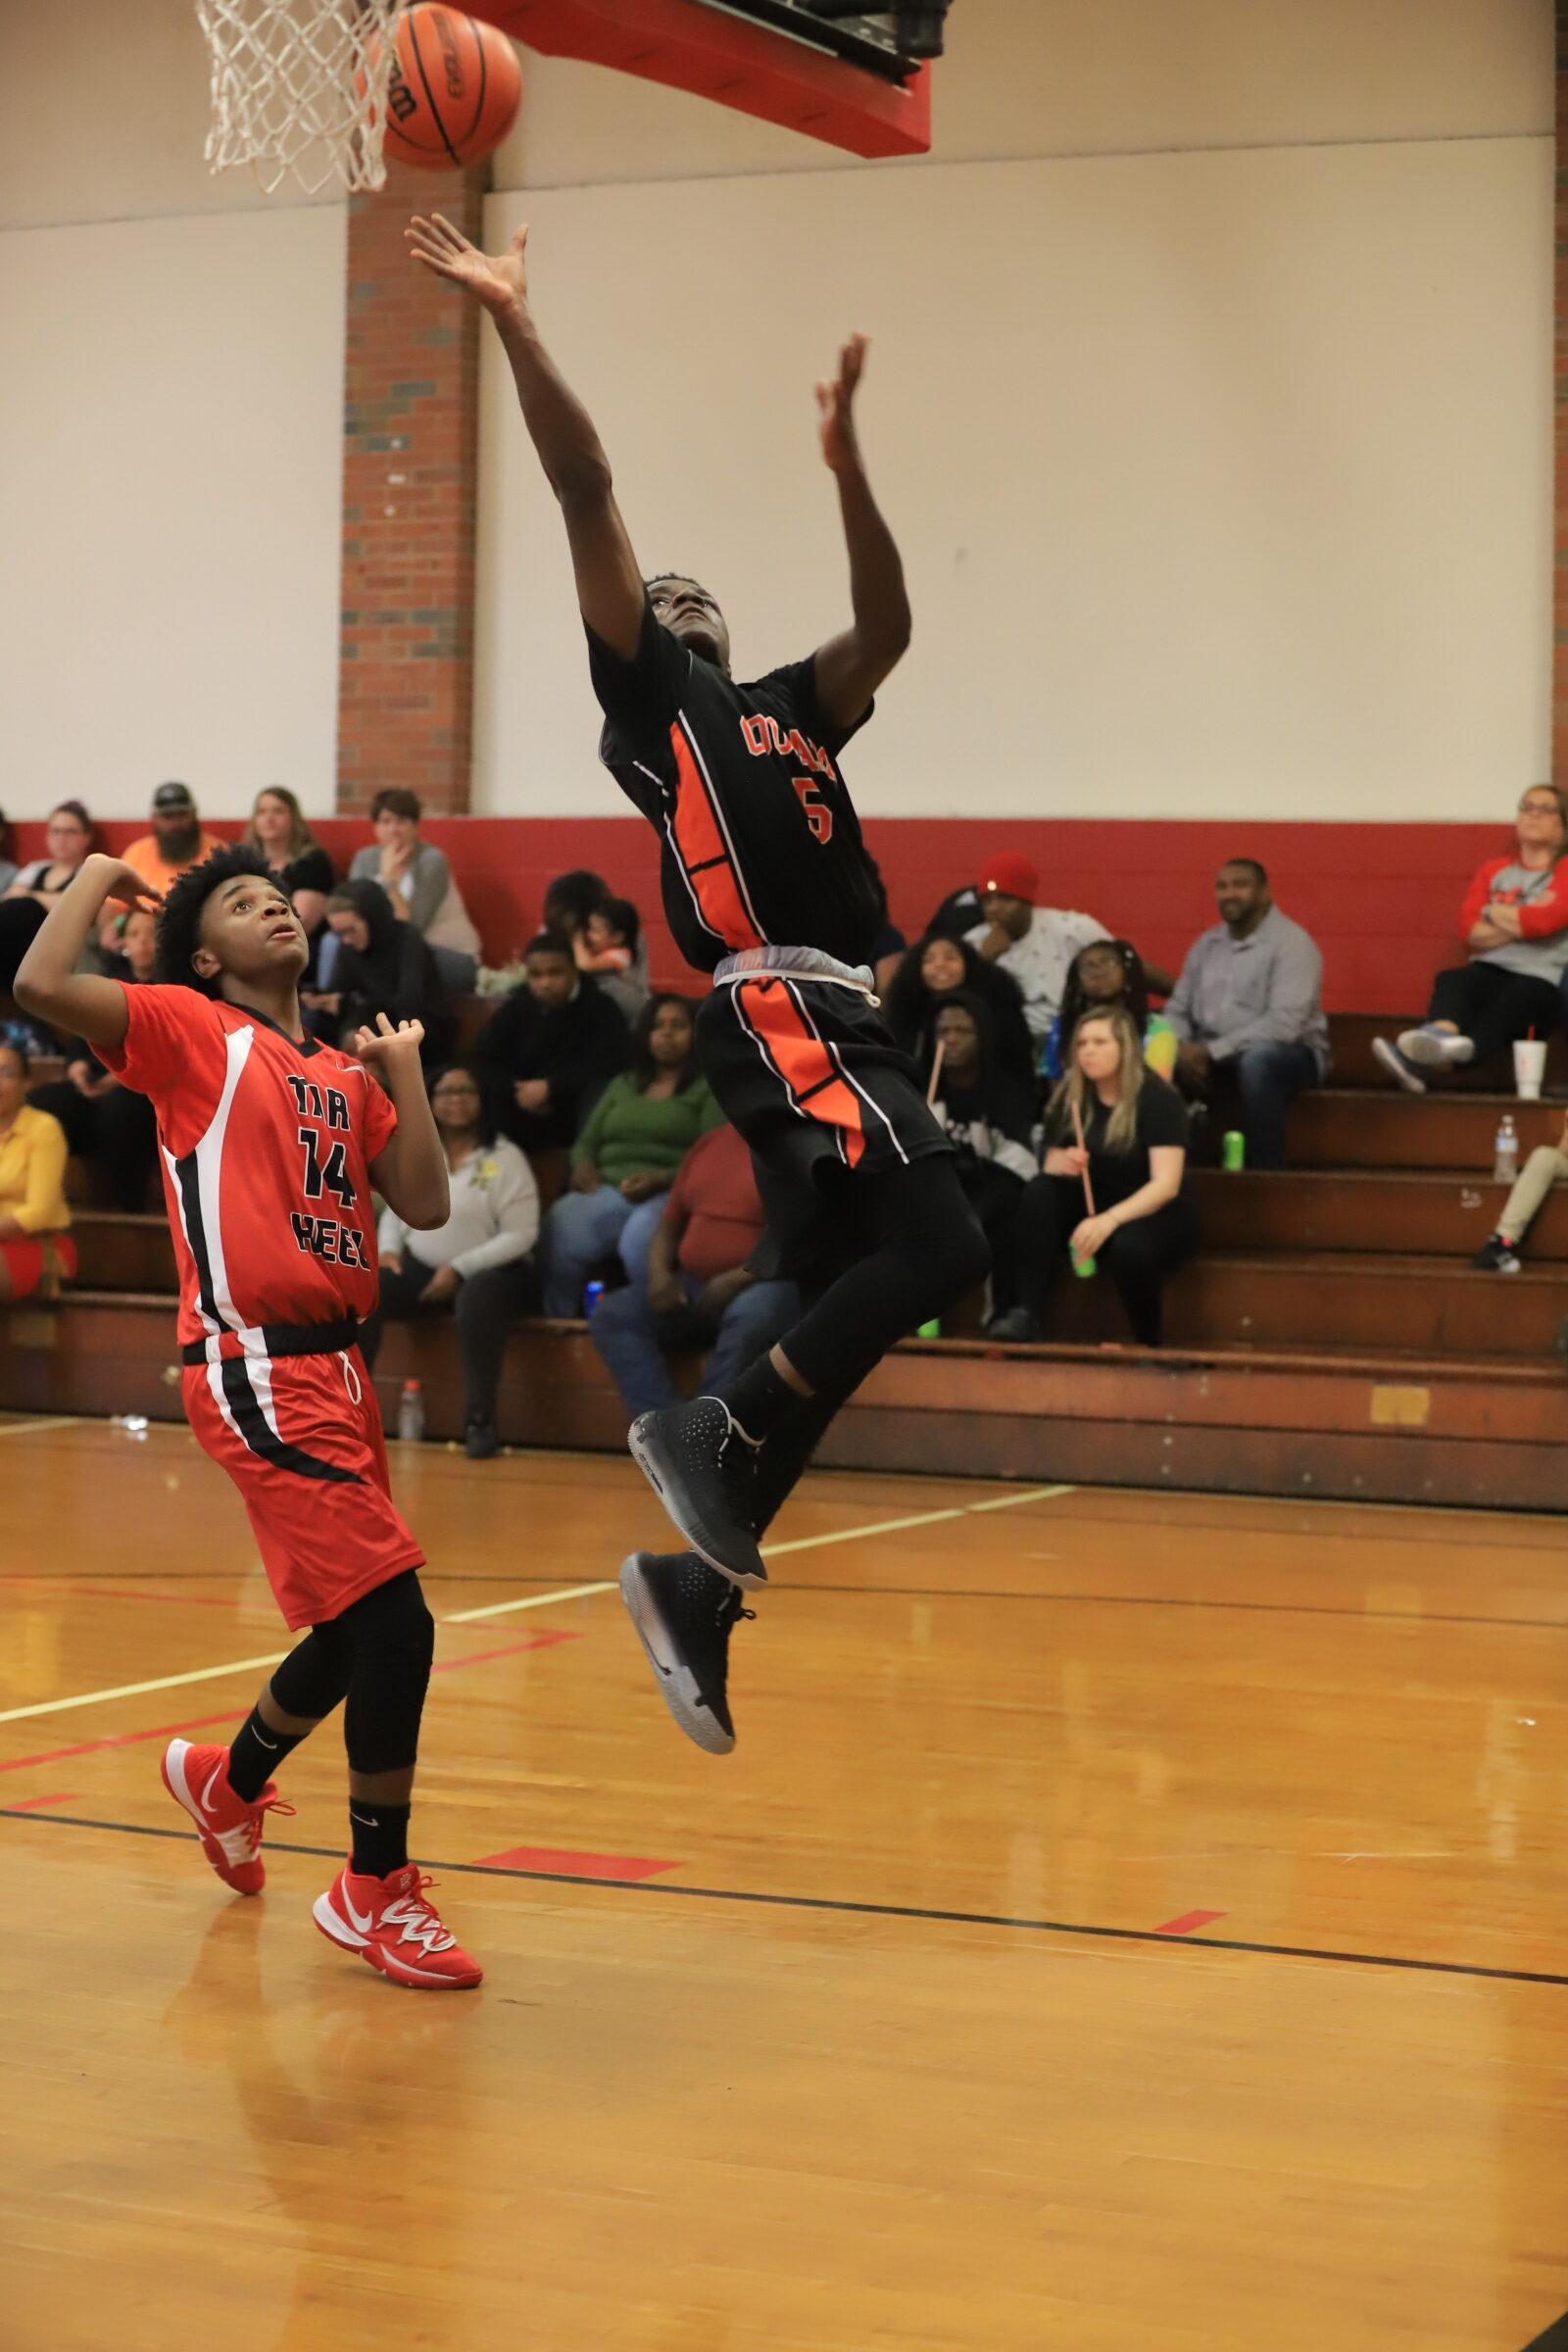 ETM vs tarheel boys basketball